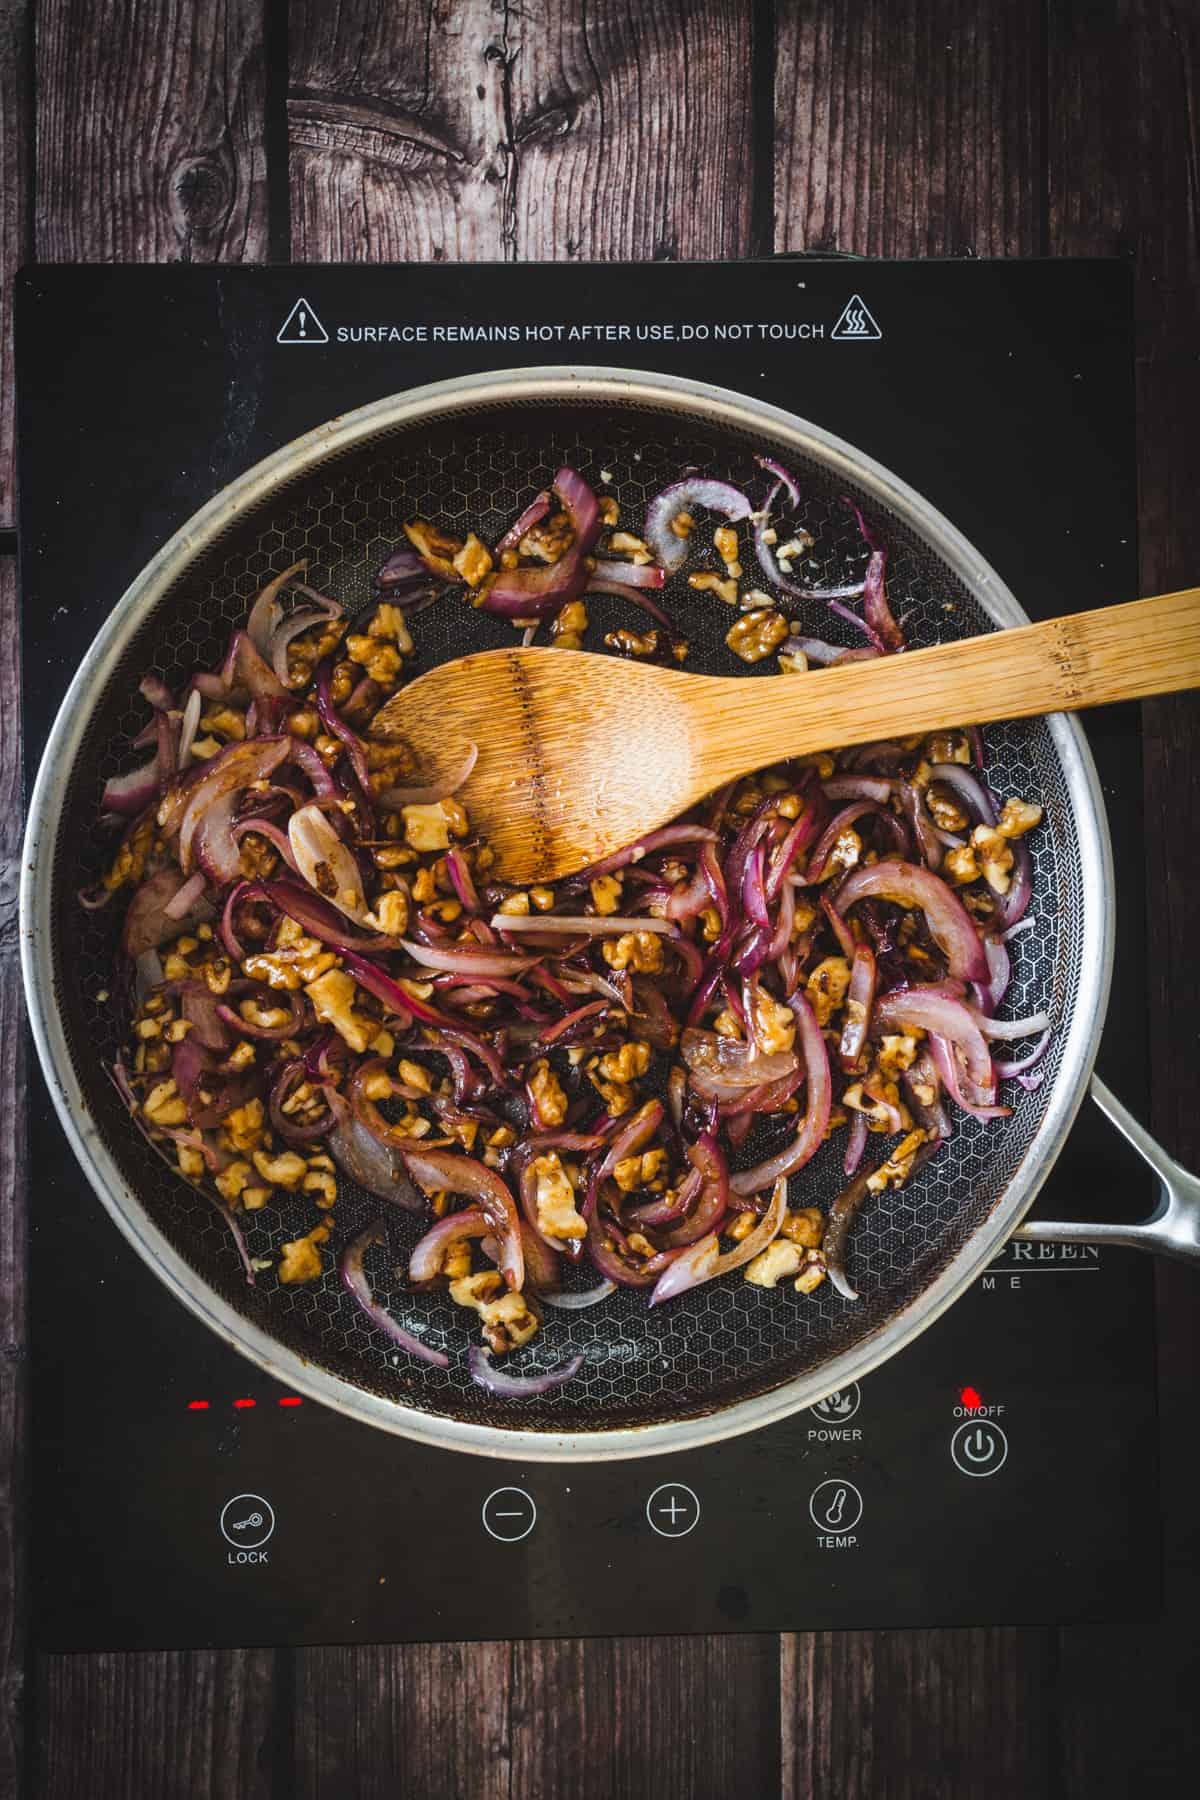 purple onions, walnuts sauteing in pan